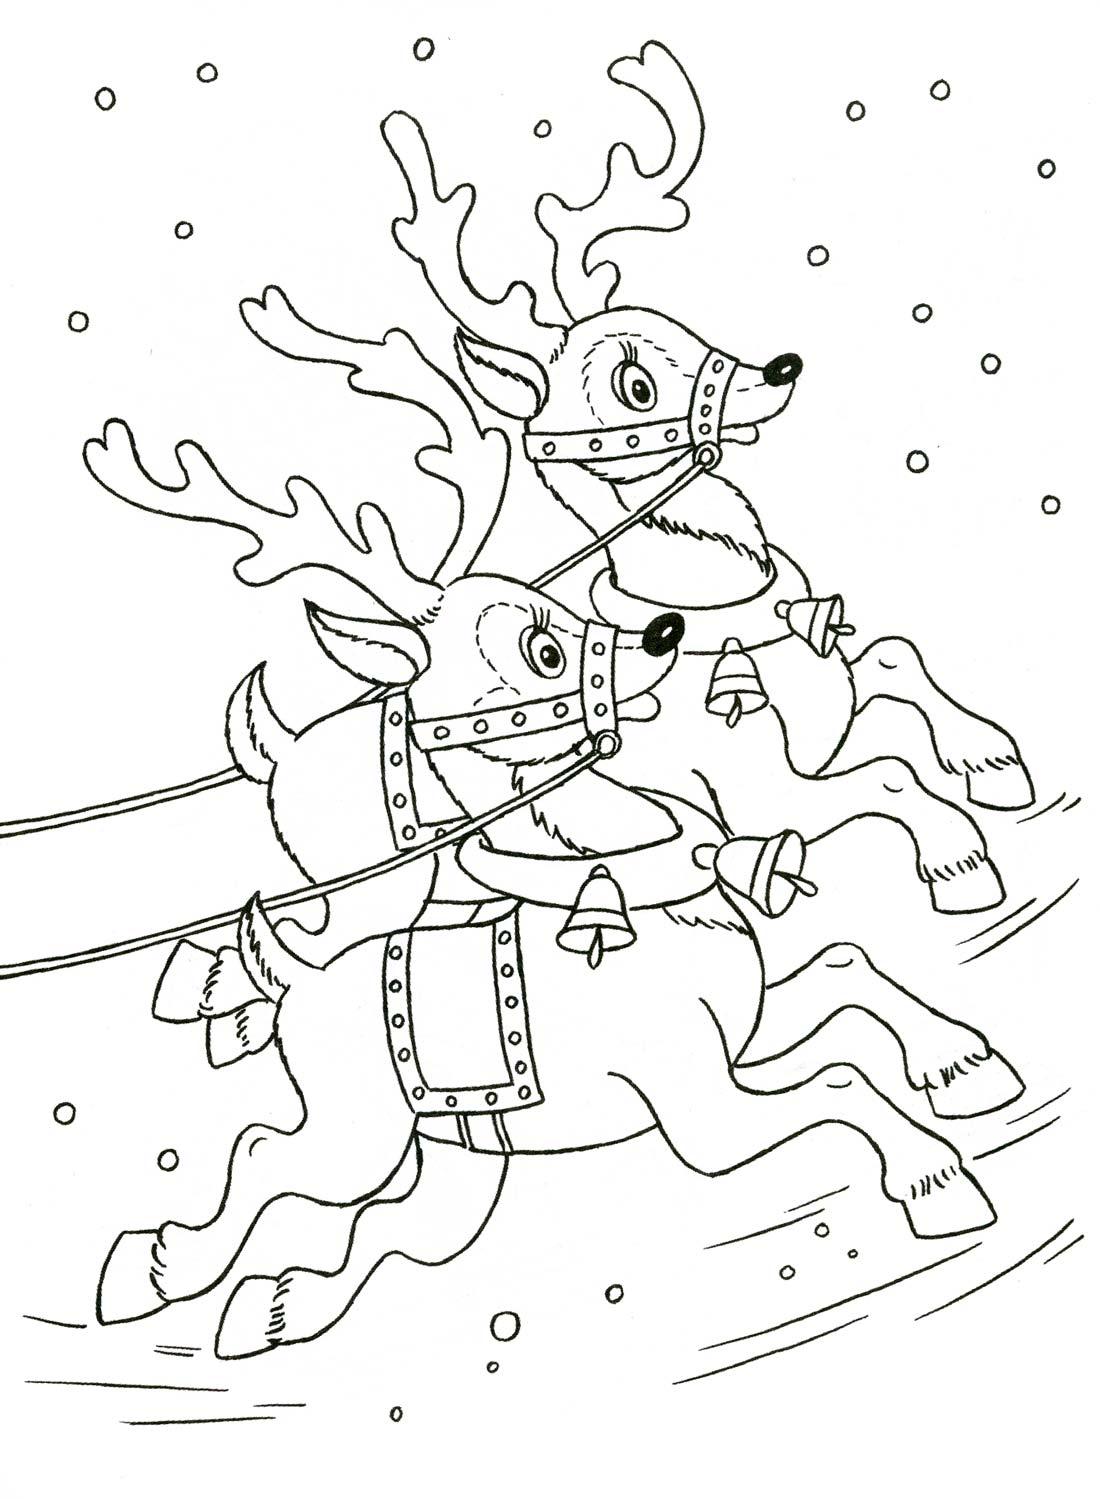 Раскраски деда мороза на оленях